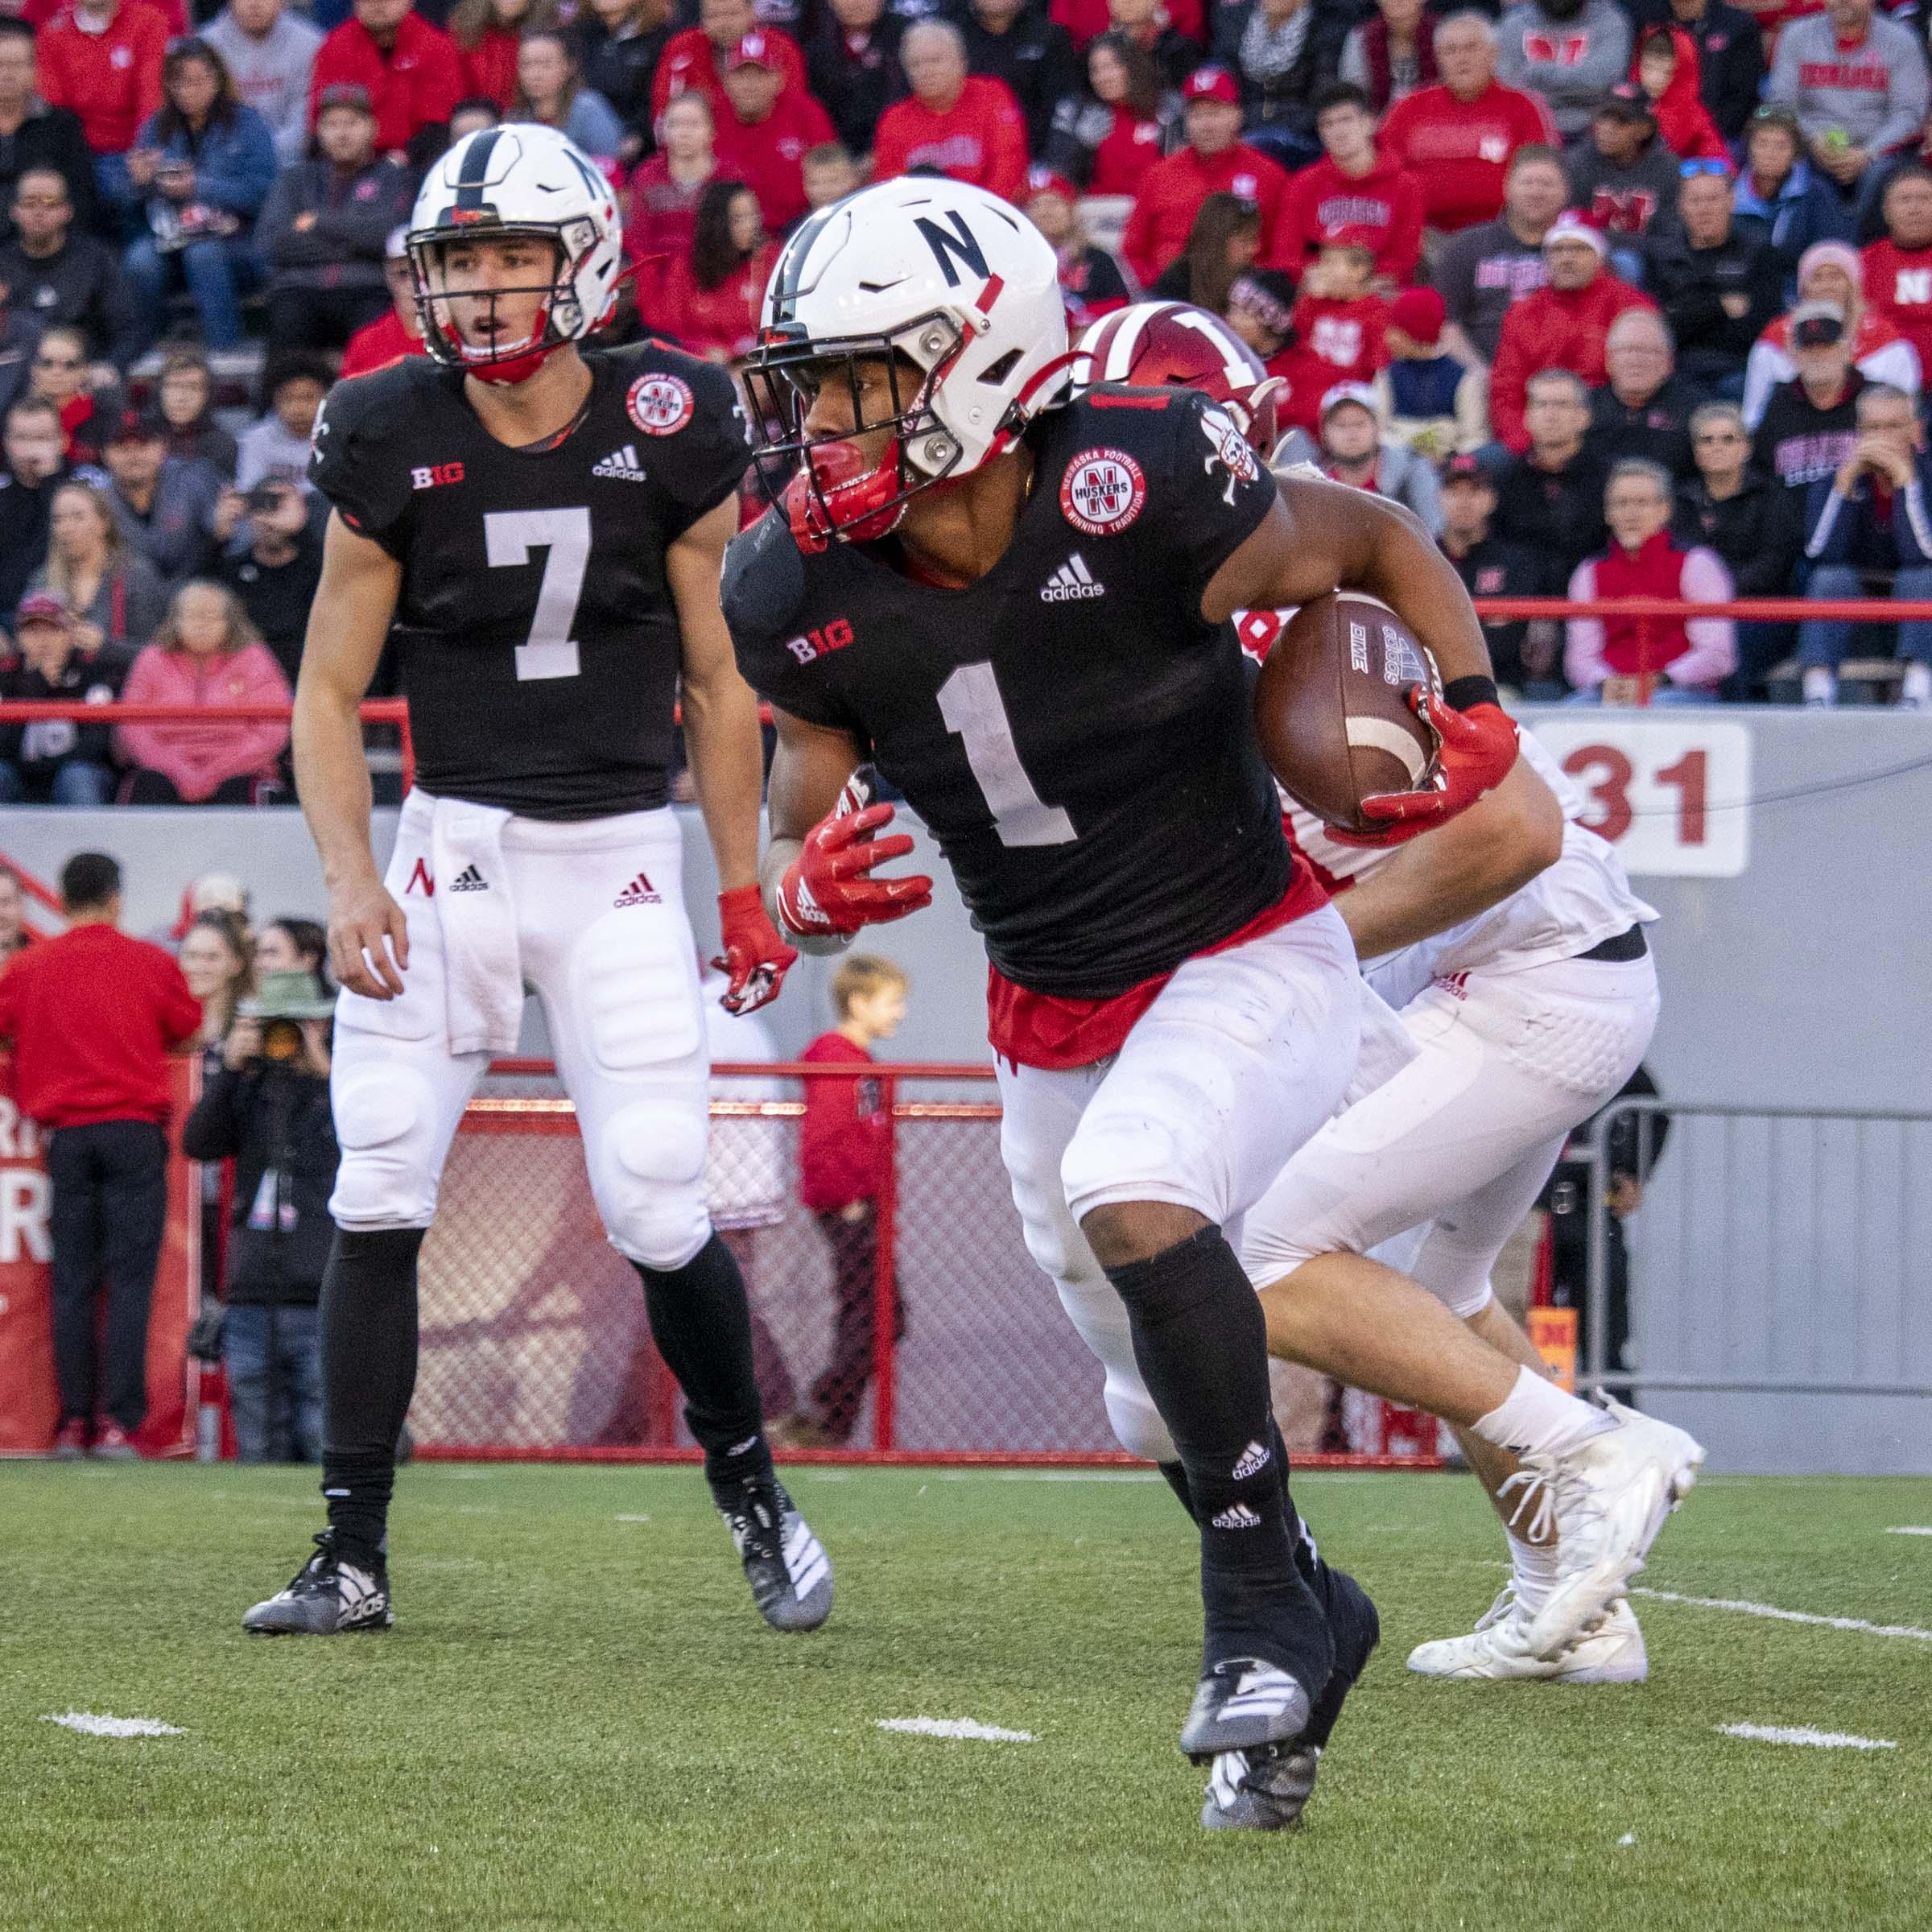 Nebraska Opens Football Season October 24 at Ohio State, Home Opener October 31 against Wisconsin